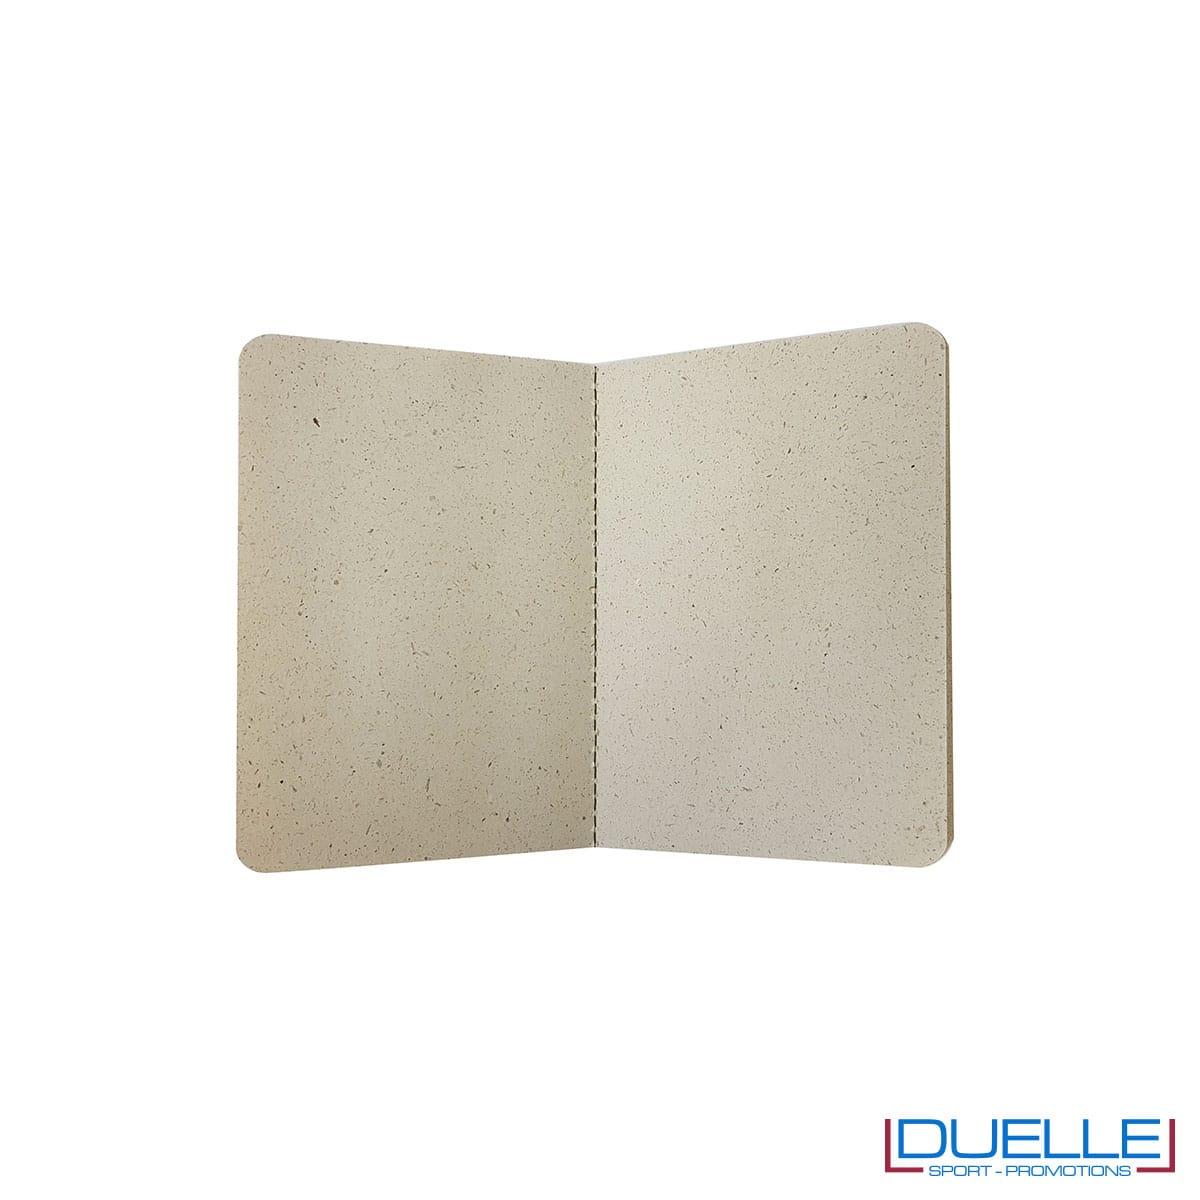 Pagine interne taccuino flessibile in carta derivante da erba essiccata